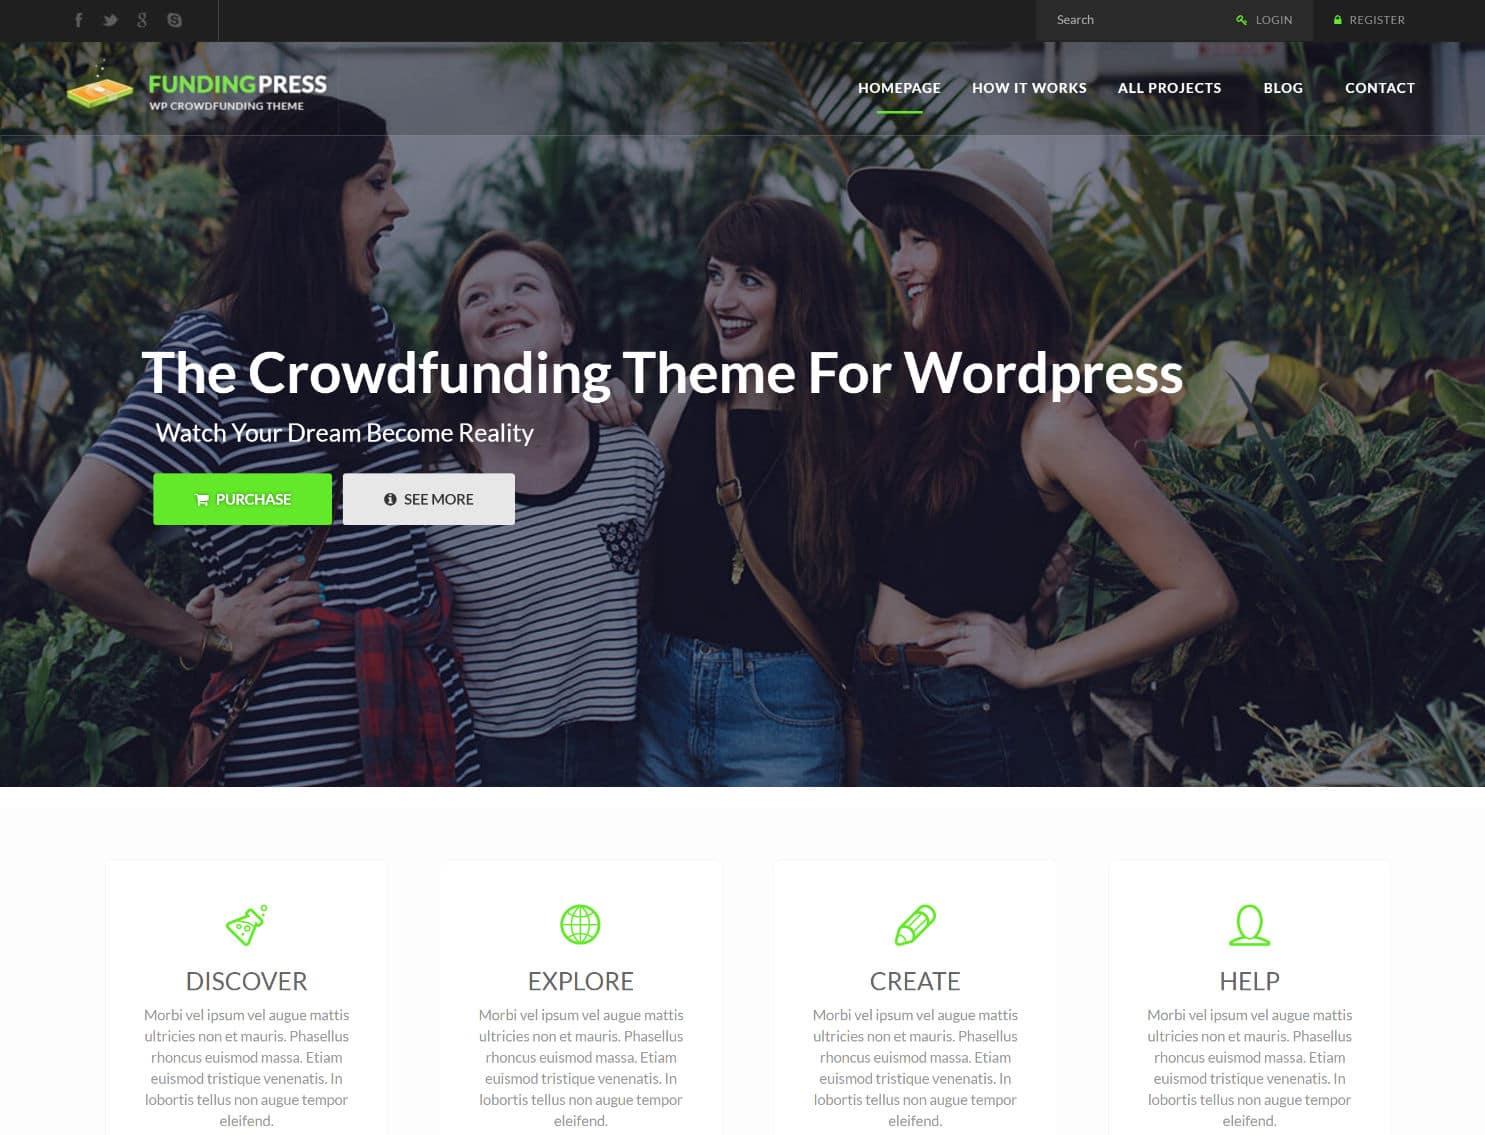 tema fundingpress wordpress